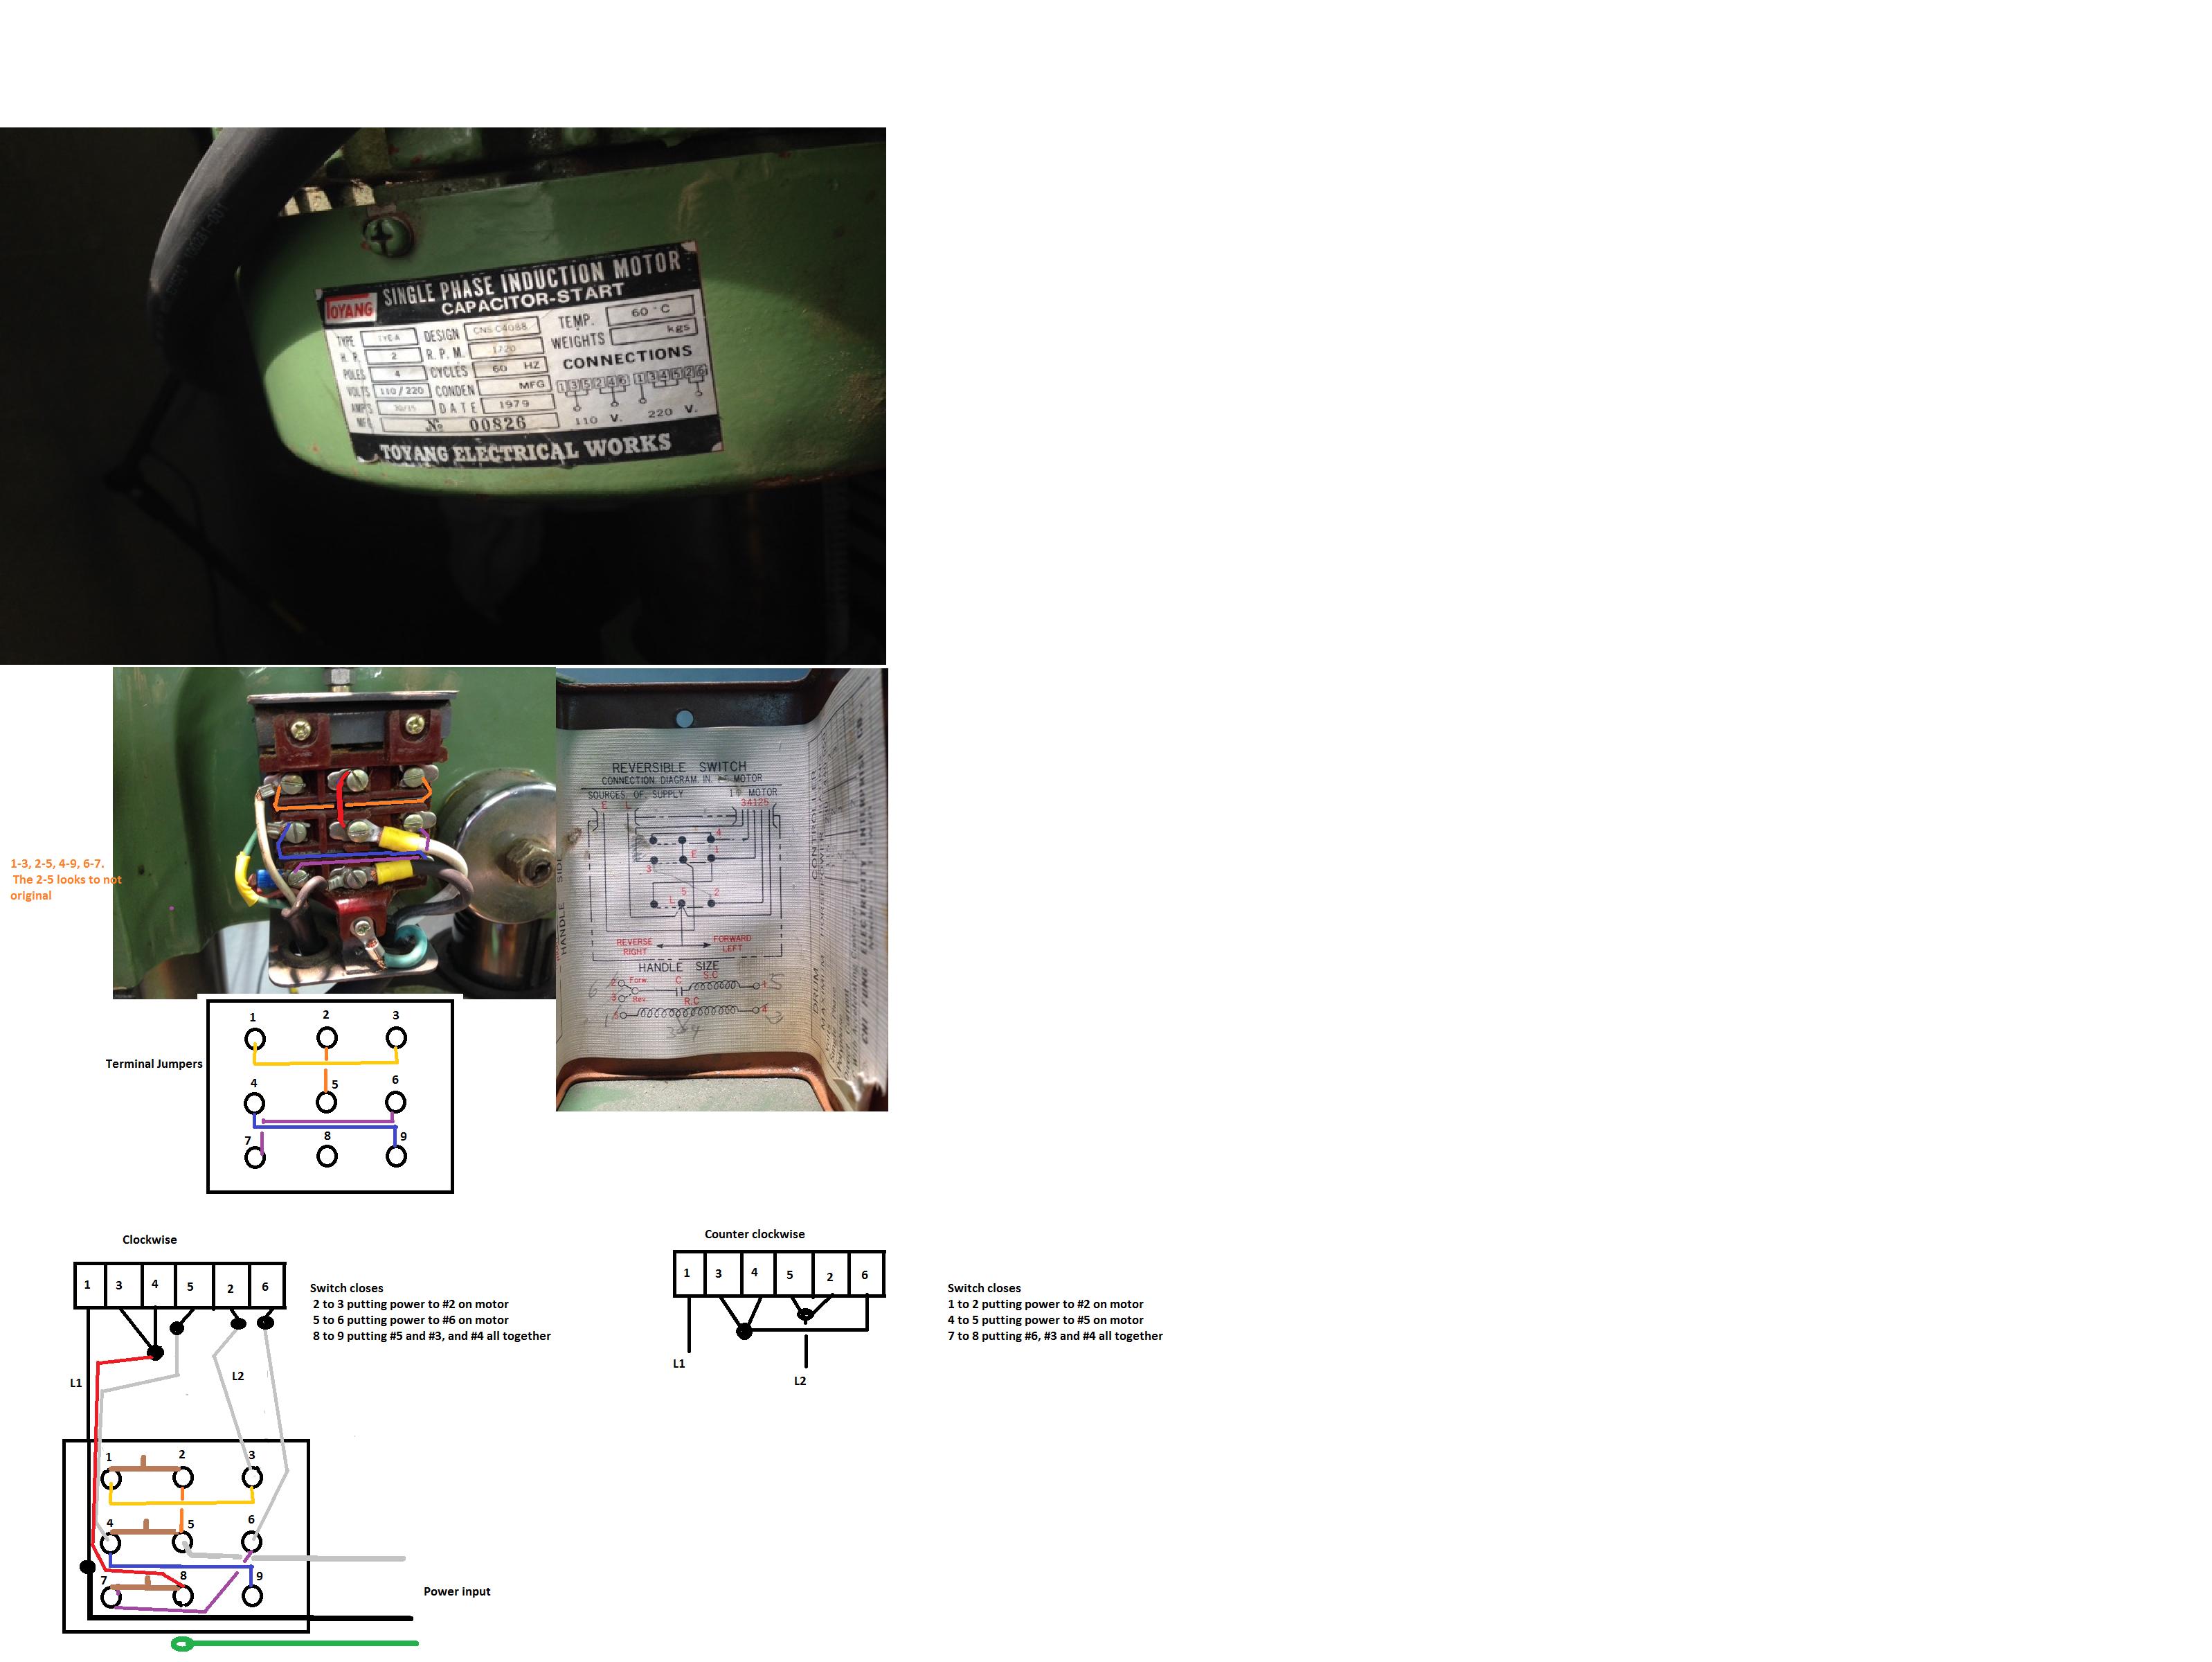 v drum switch wiring diagram on submersible pump wiring diagram, 220v  three-phase wiring